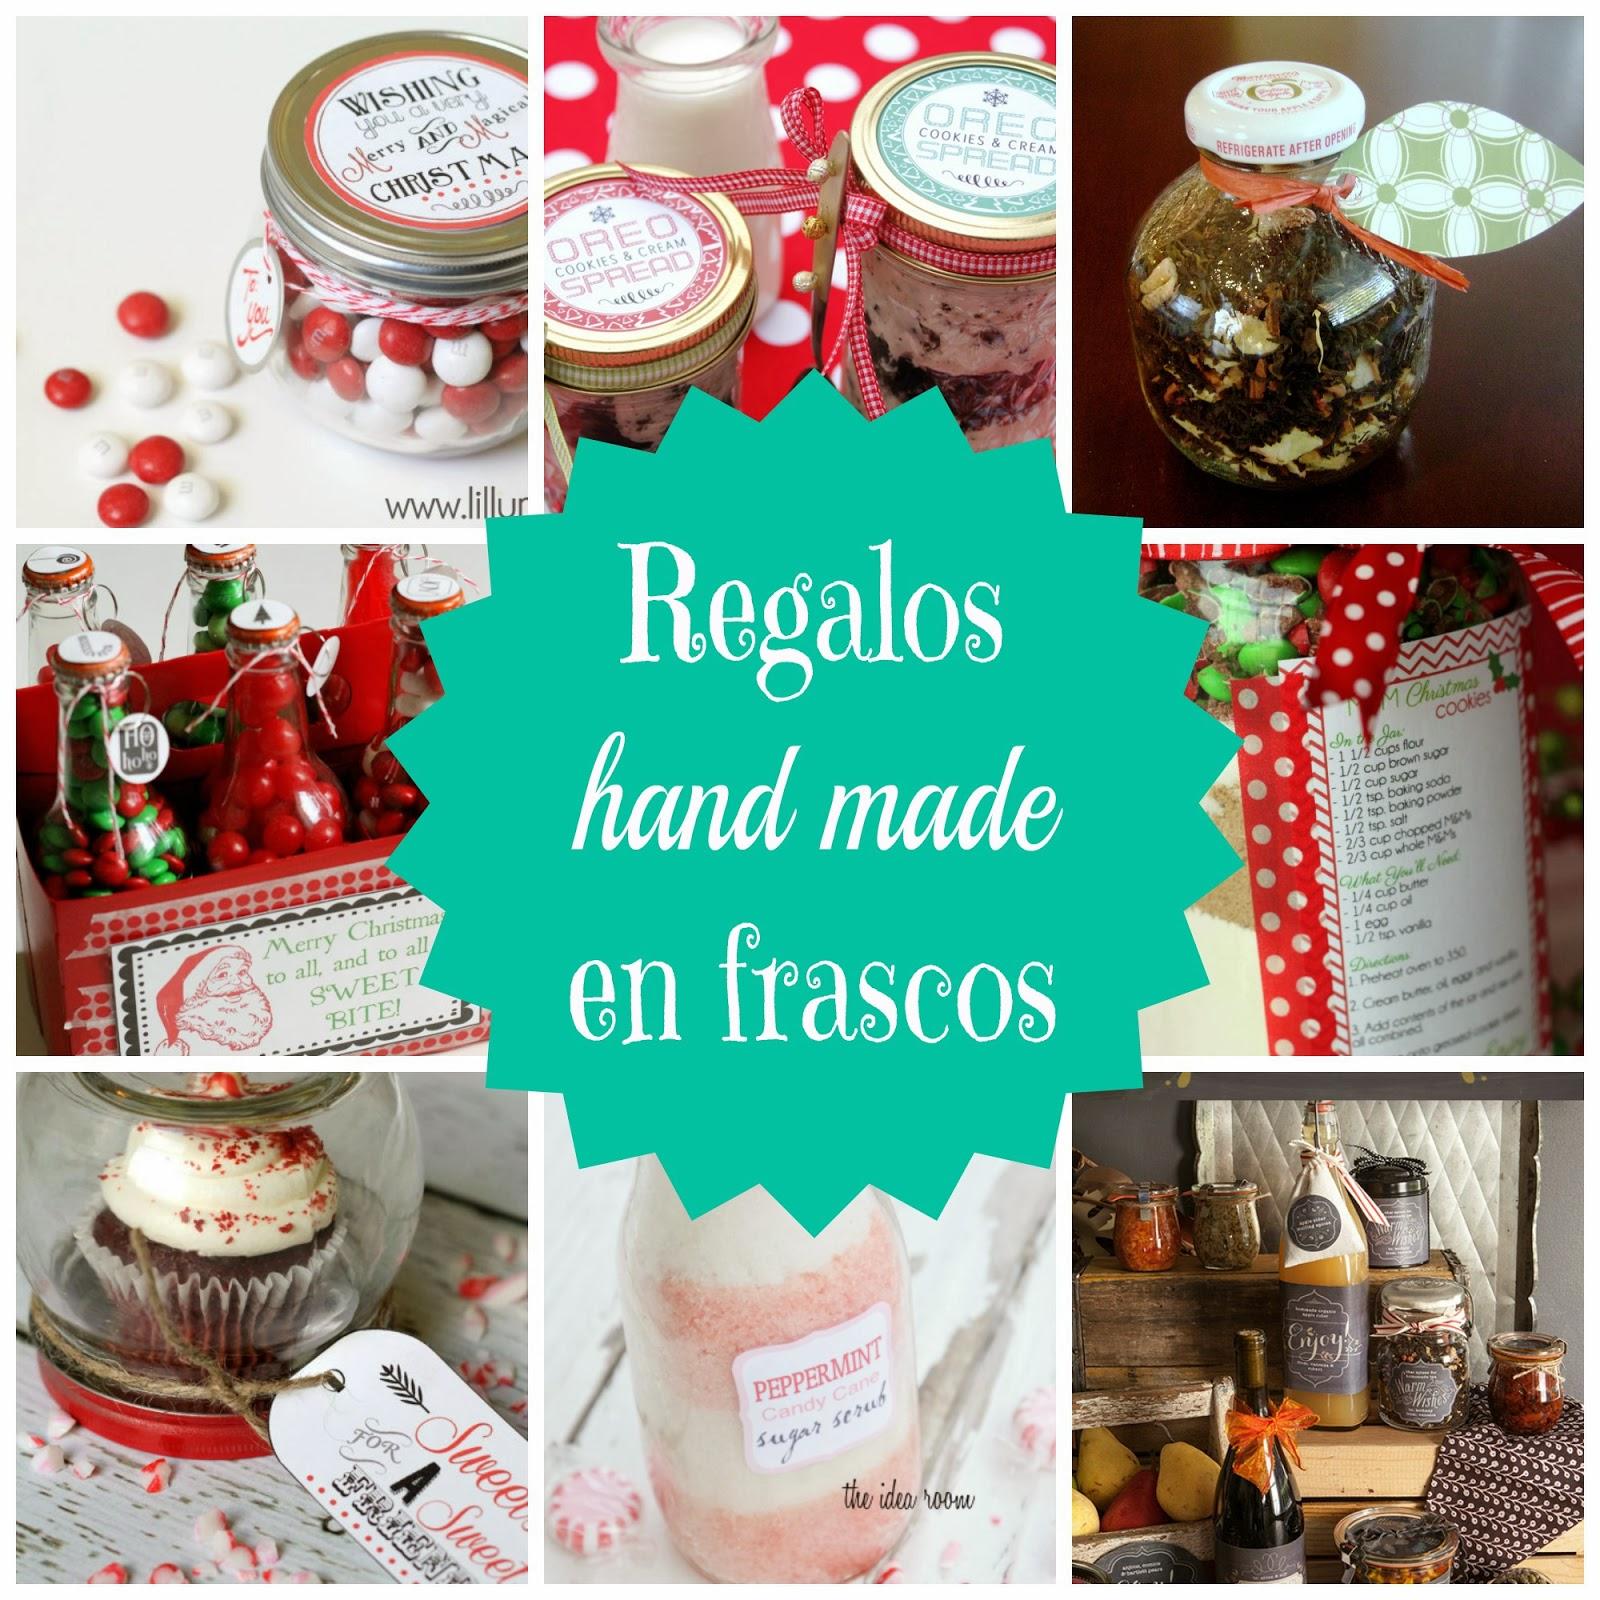 Top 10:  Regalos Hand Made en Frascos